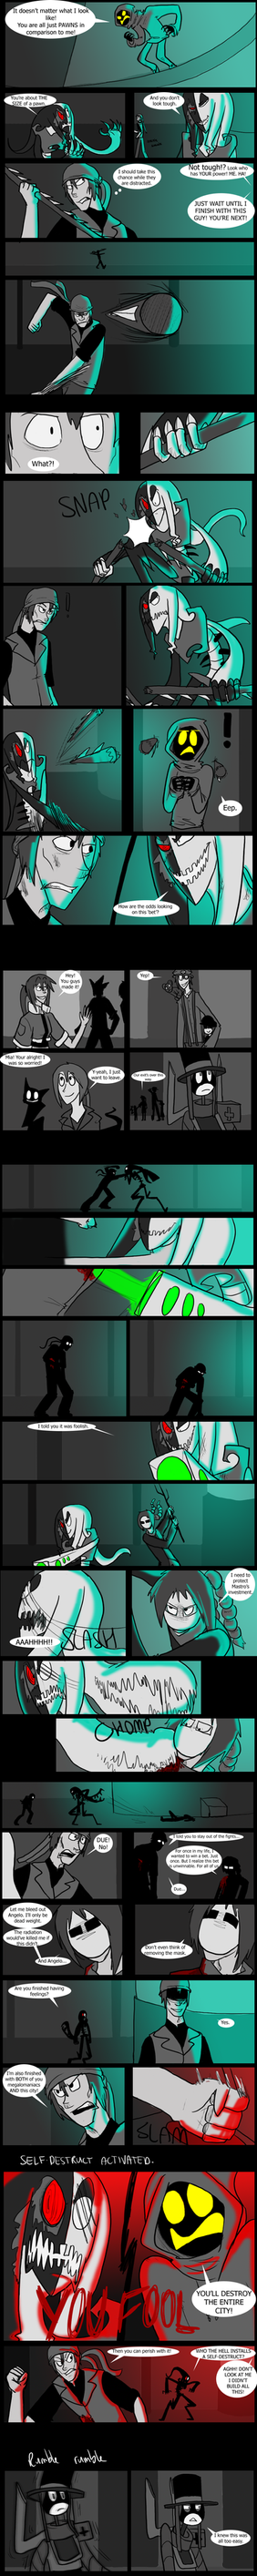 NT Final pt. 3 by LulzyRobot